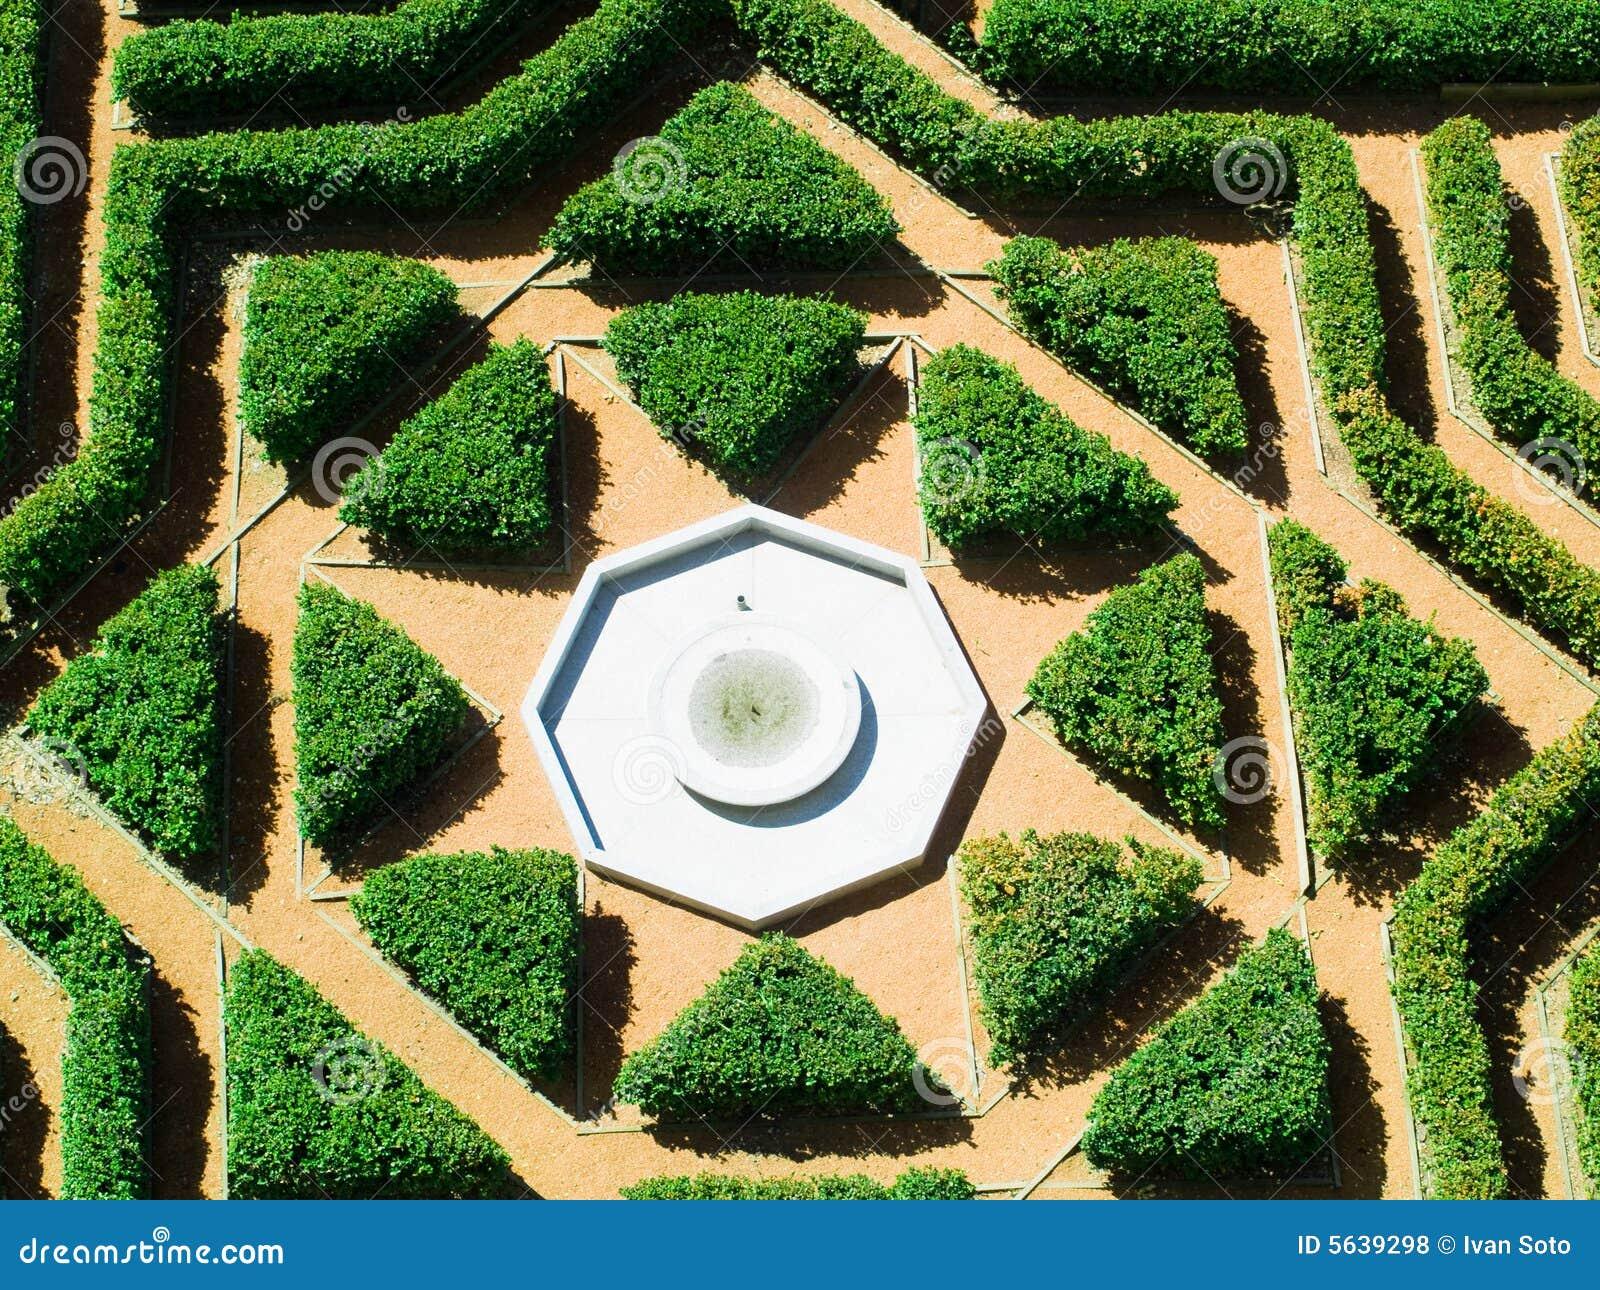 Geometrical Garden Royalty Free Stock Photos Image 5639298